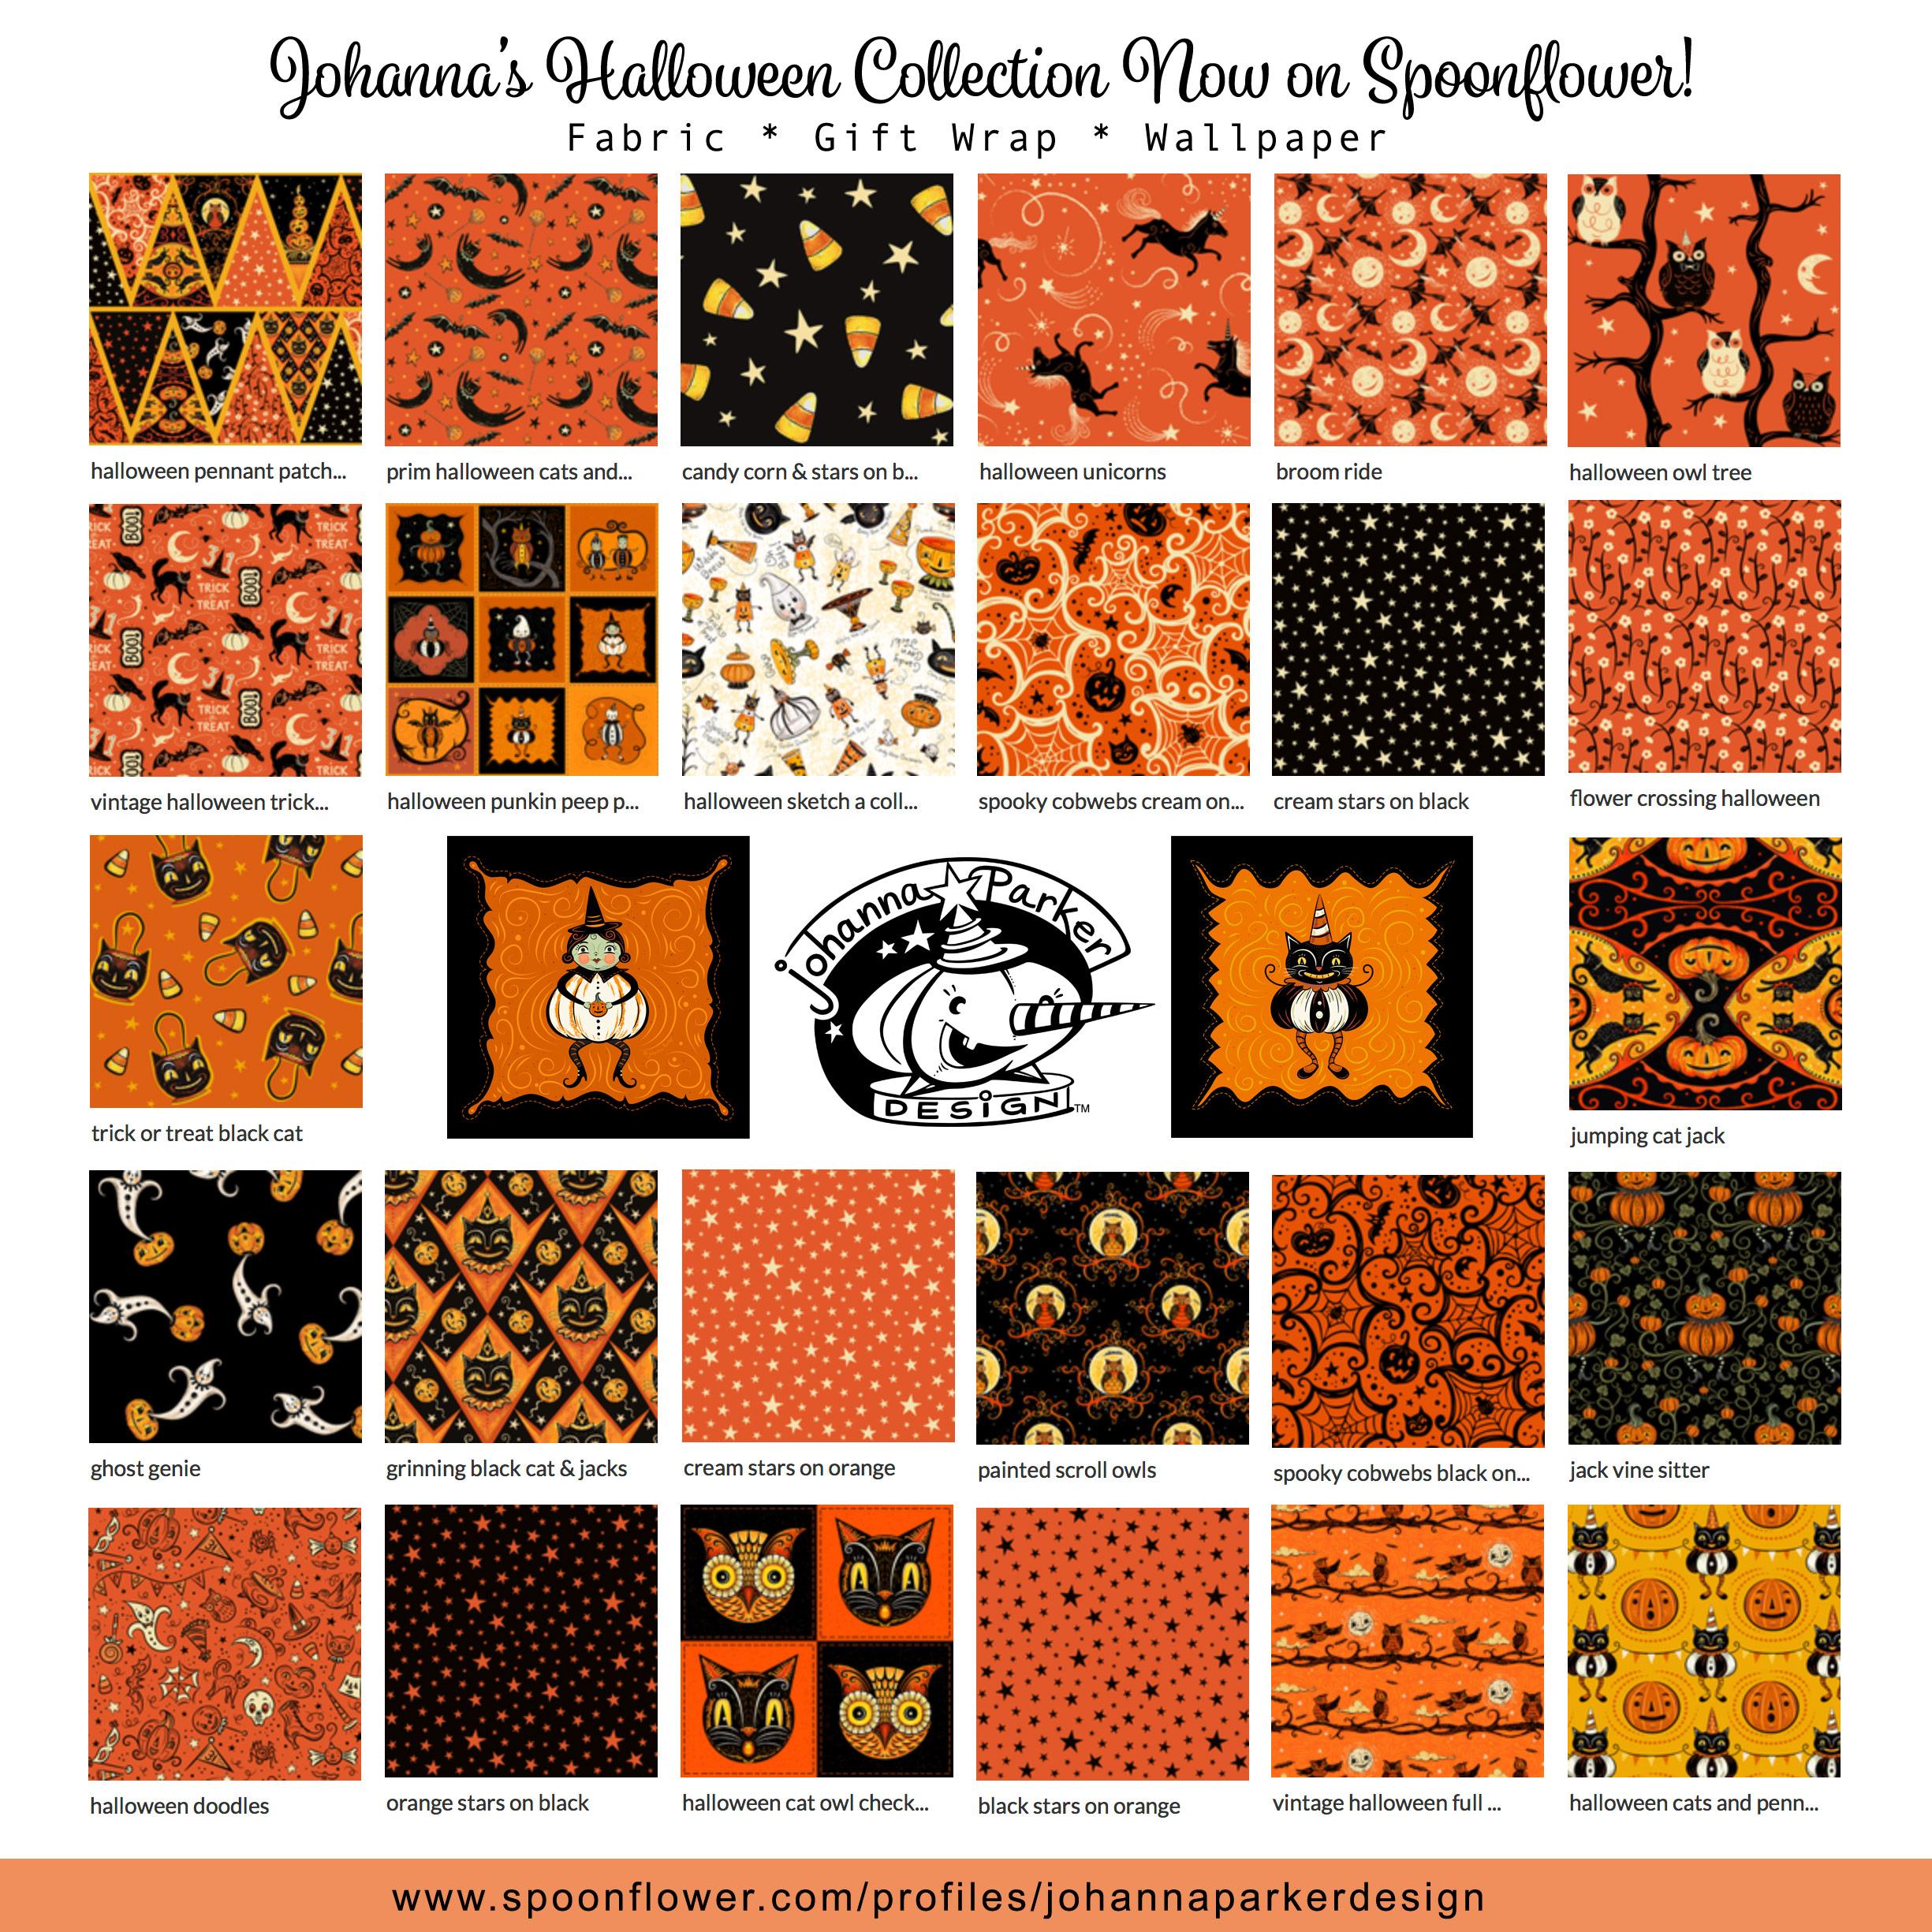 Johanna-Parker-Design-Halloween-Samples-Spoonflower.jpg